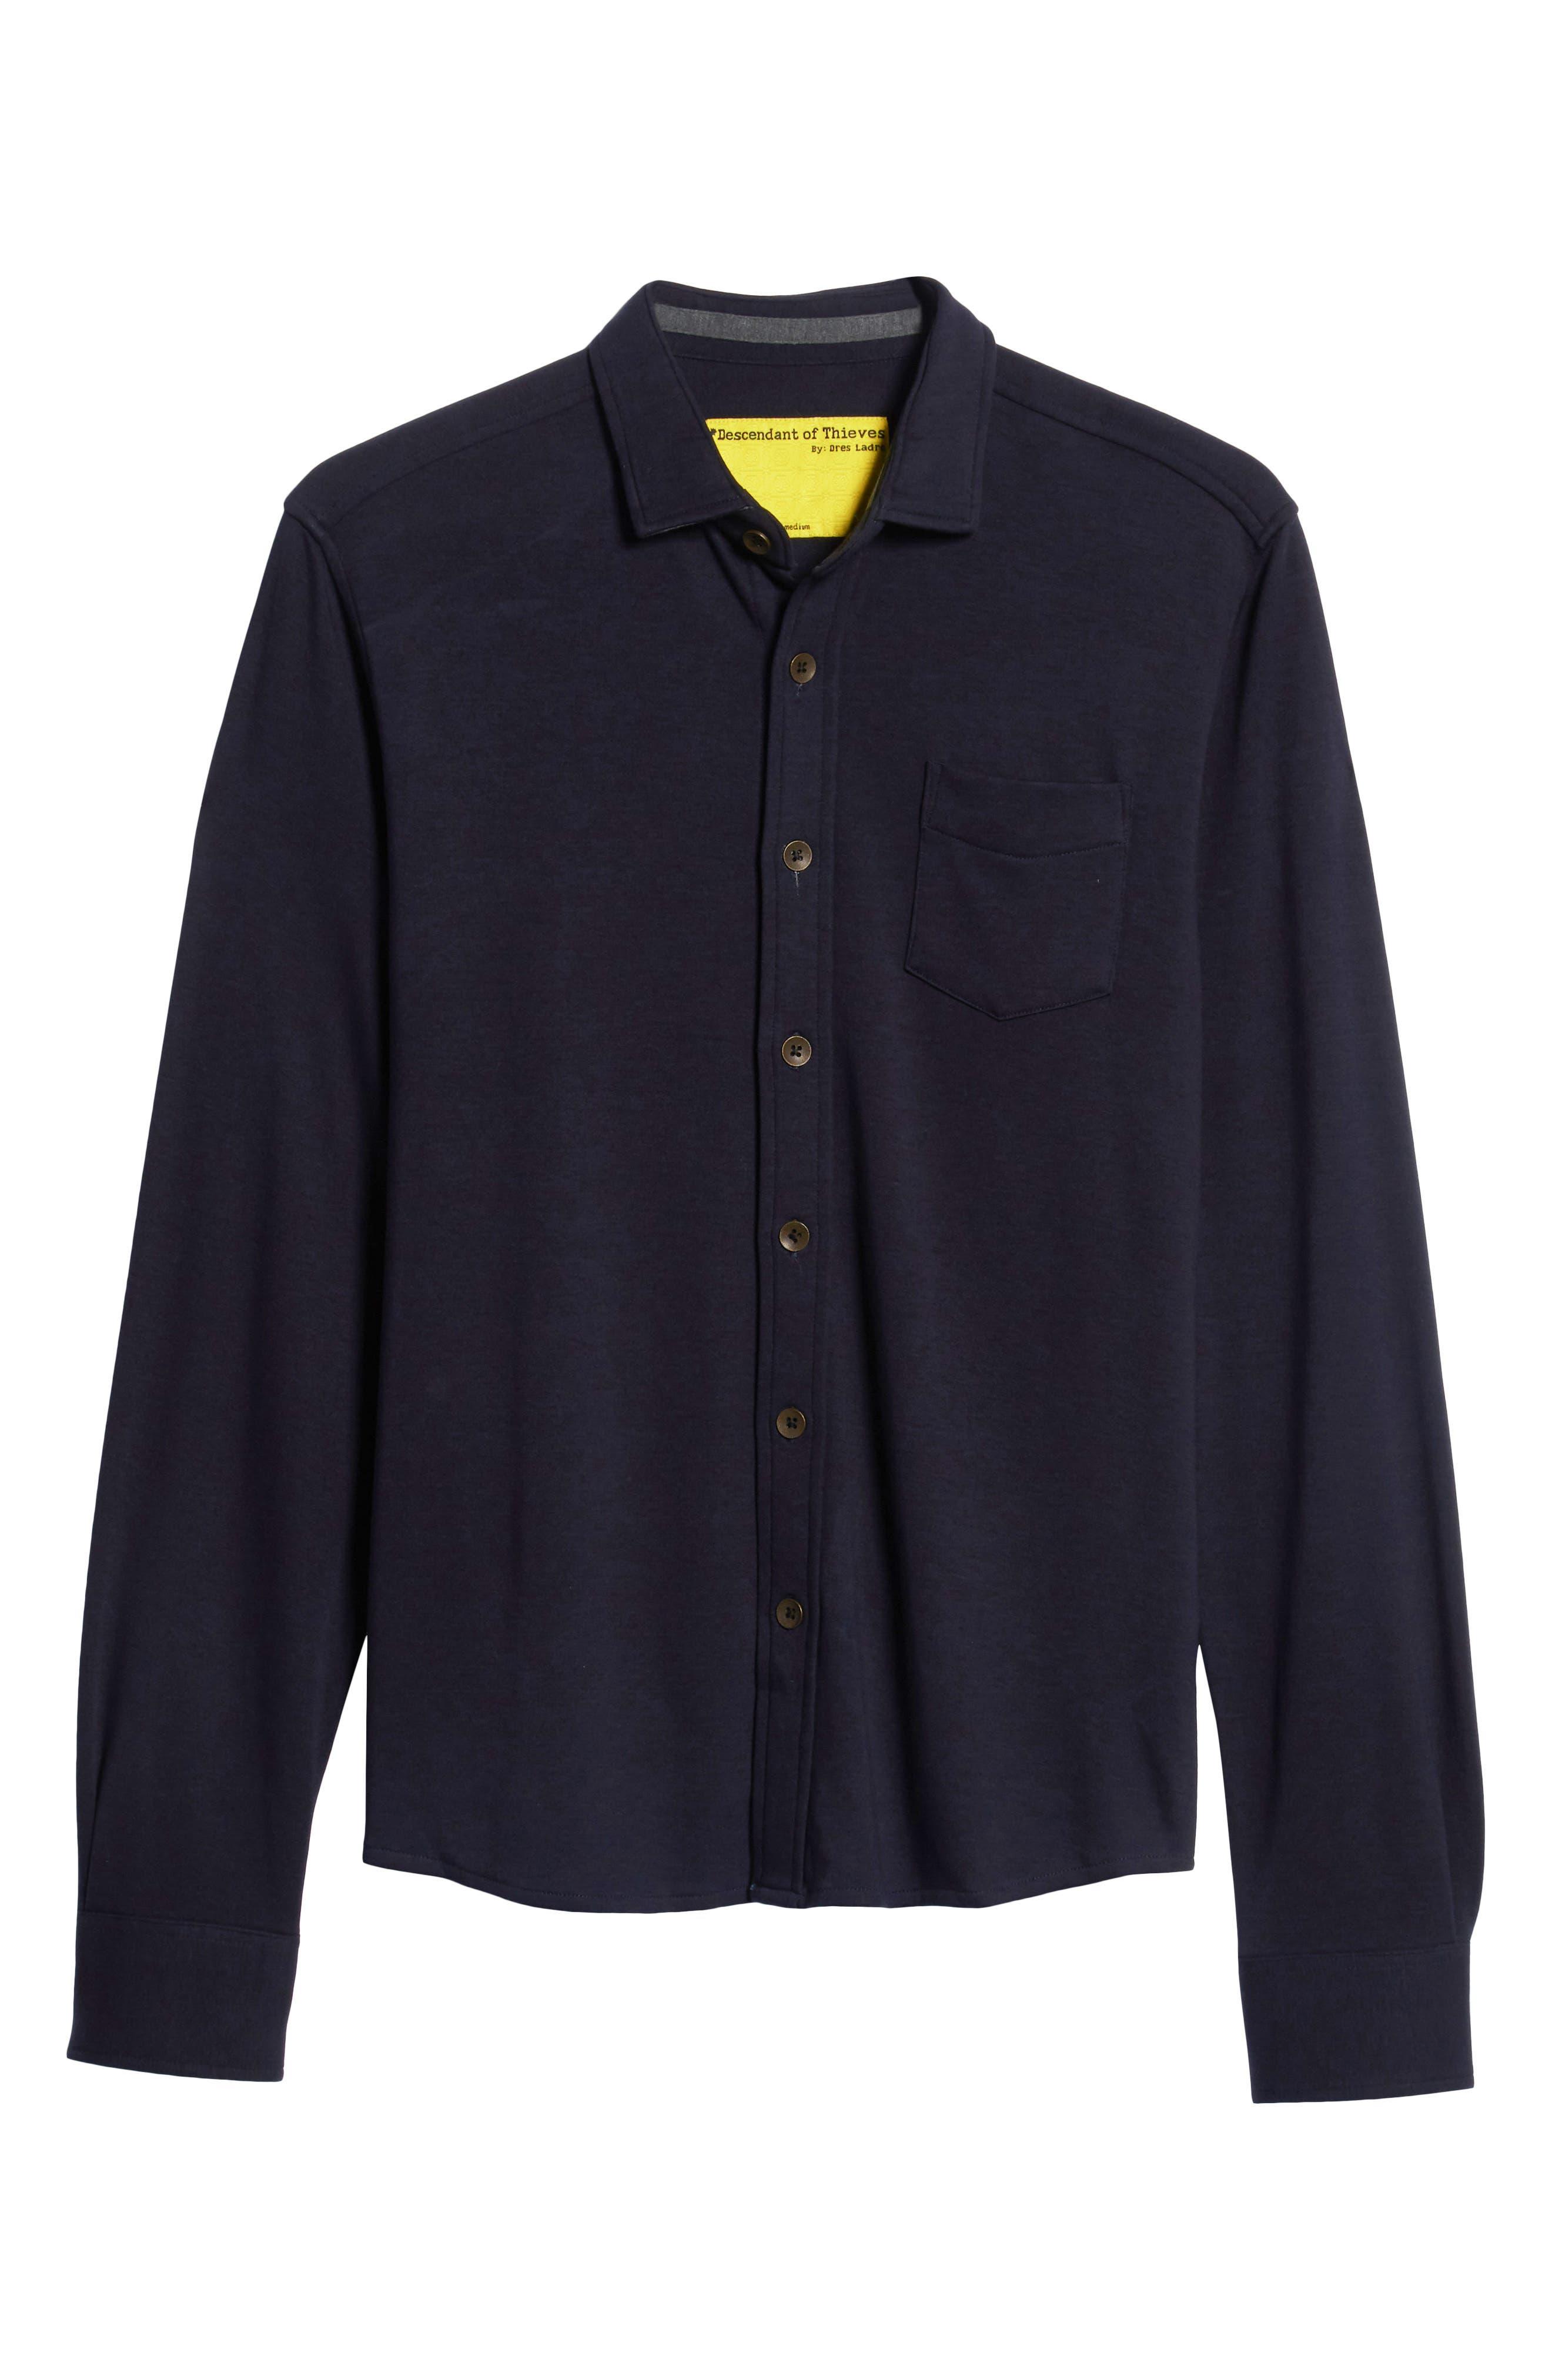 Shirt Killer Woven Shirt,                             Alternate thumbnail 5, color,                             NAVY